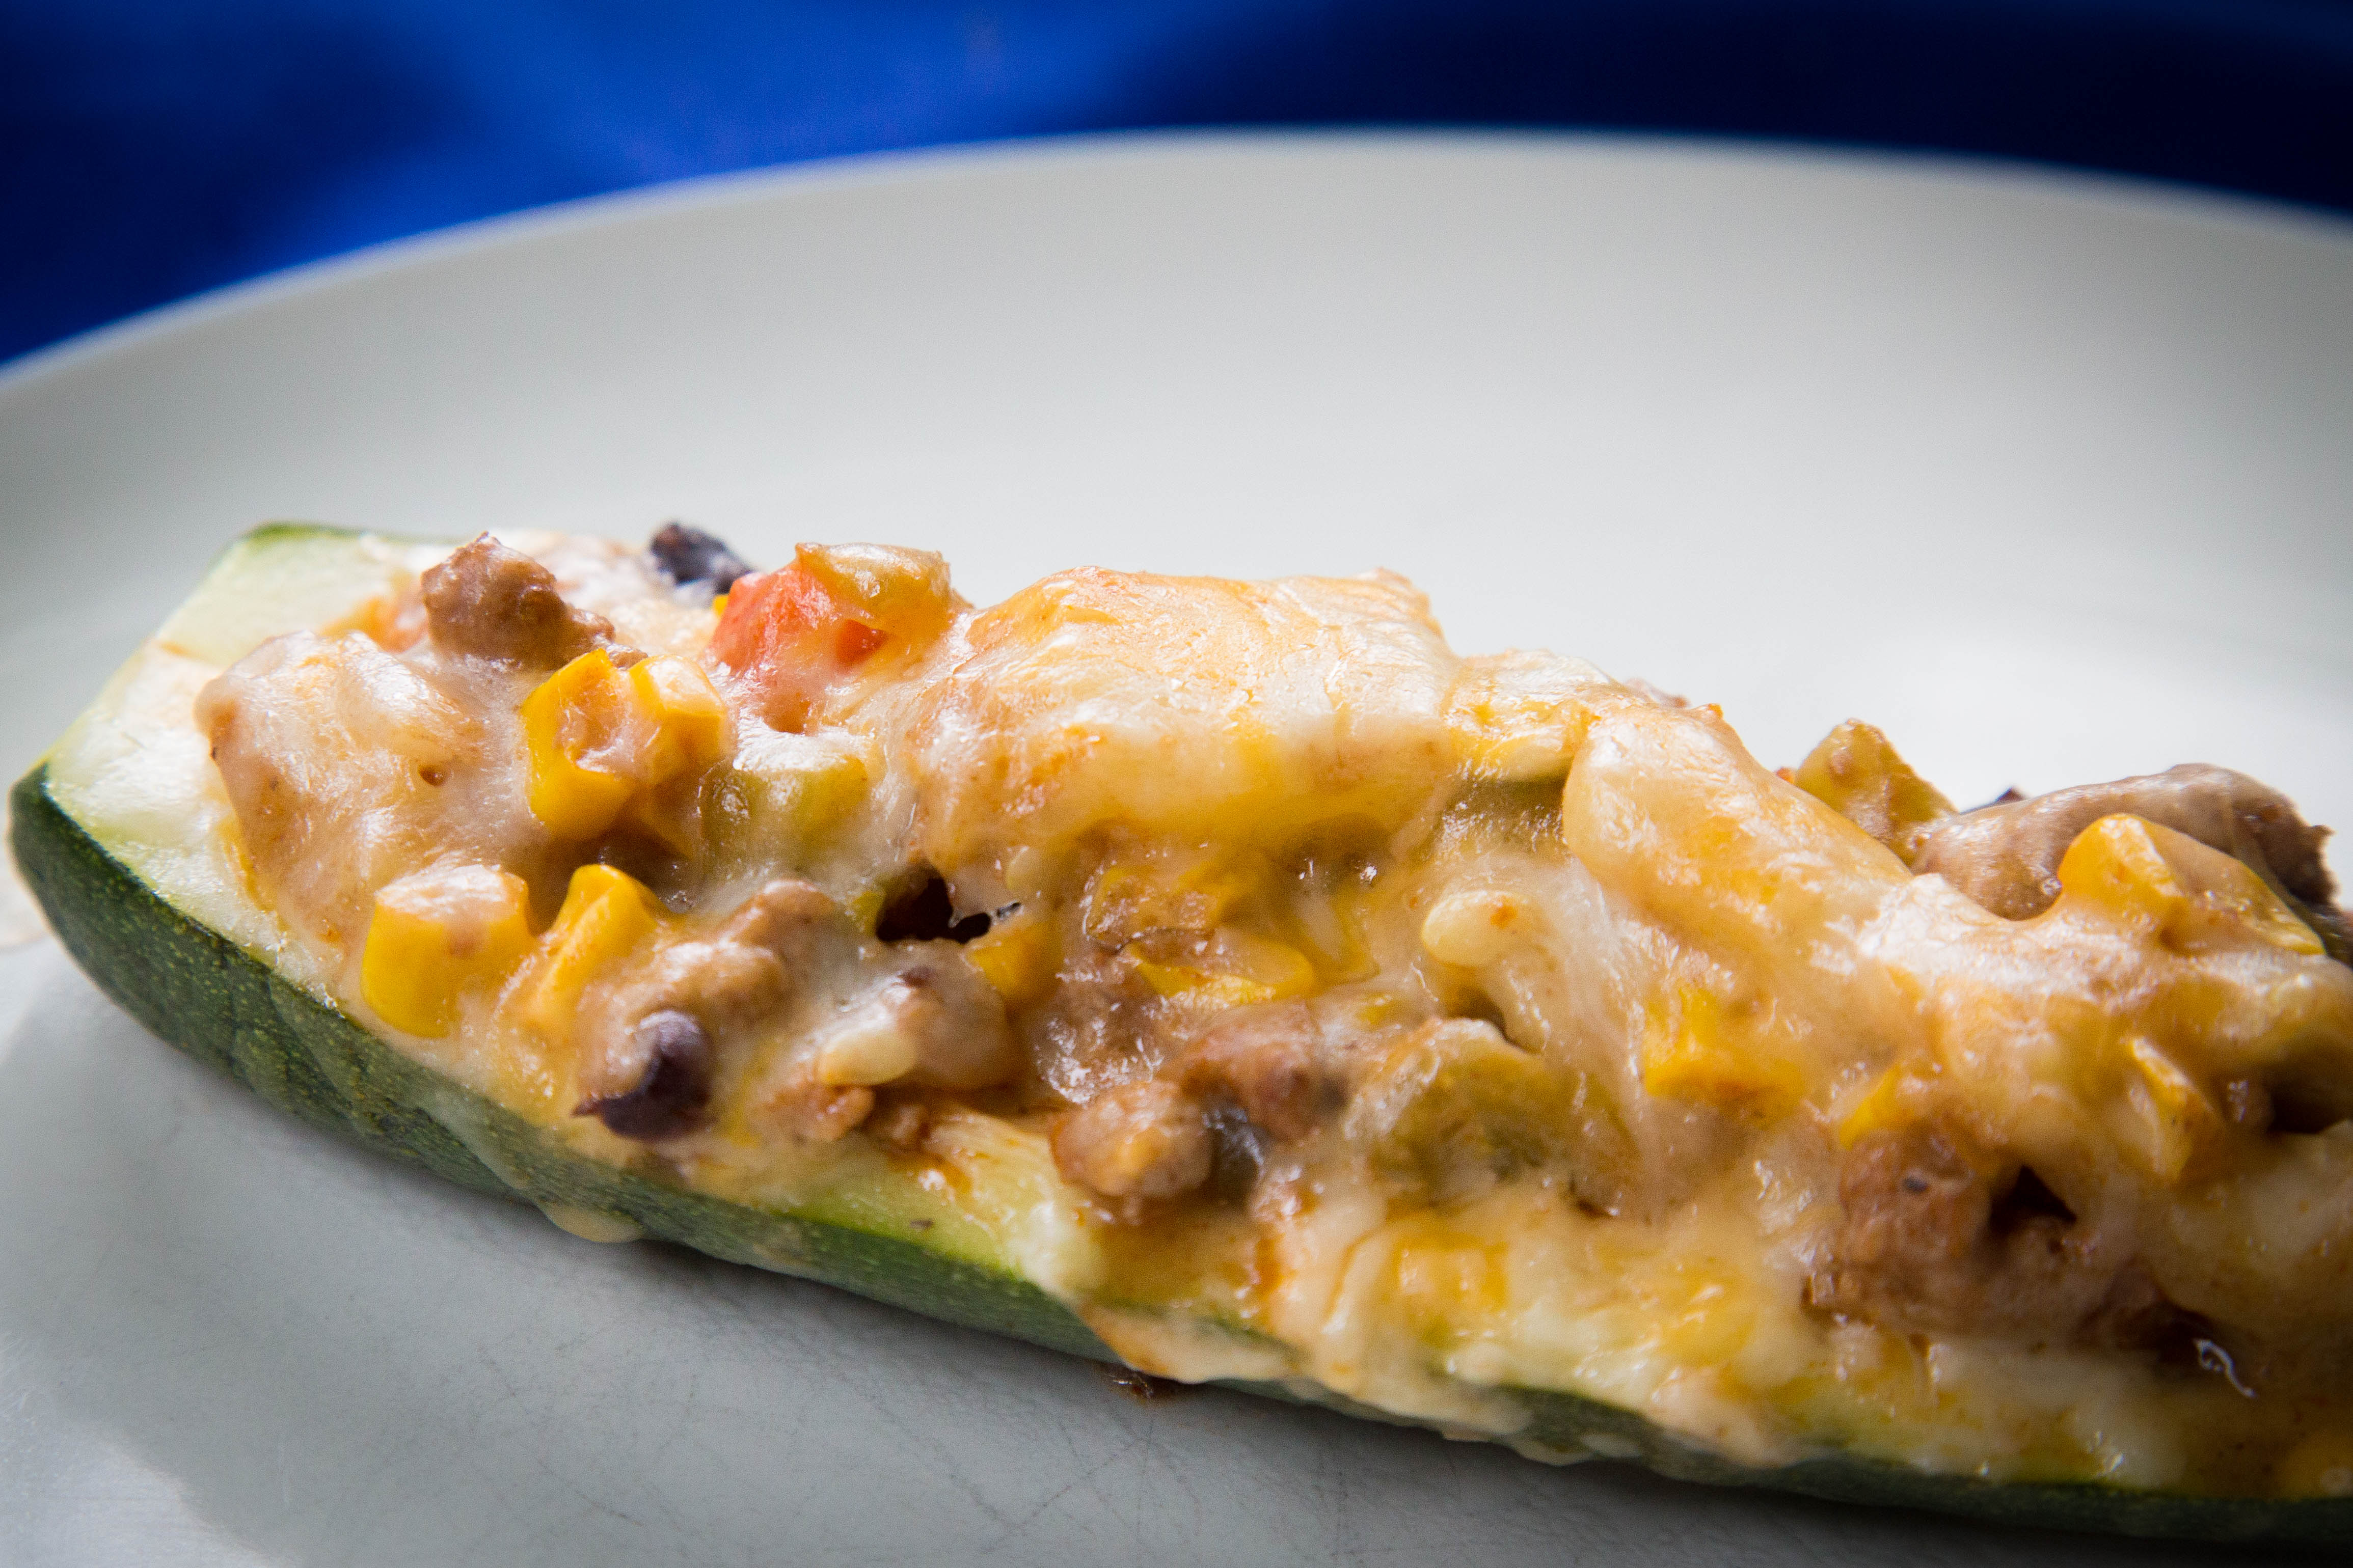 Sunday Afternoon Lunch - Enchilada Stuffed Zucchini Boats ...